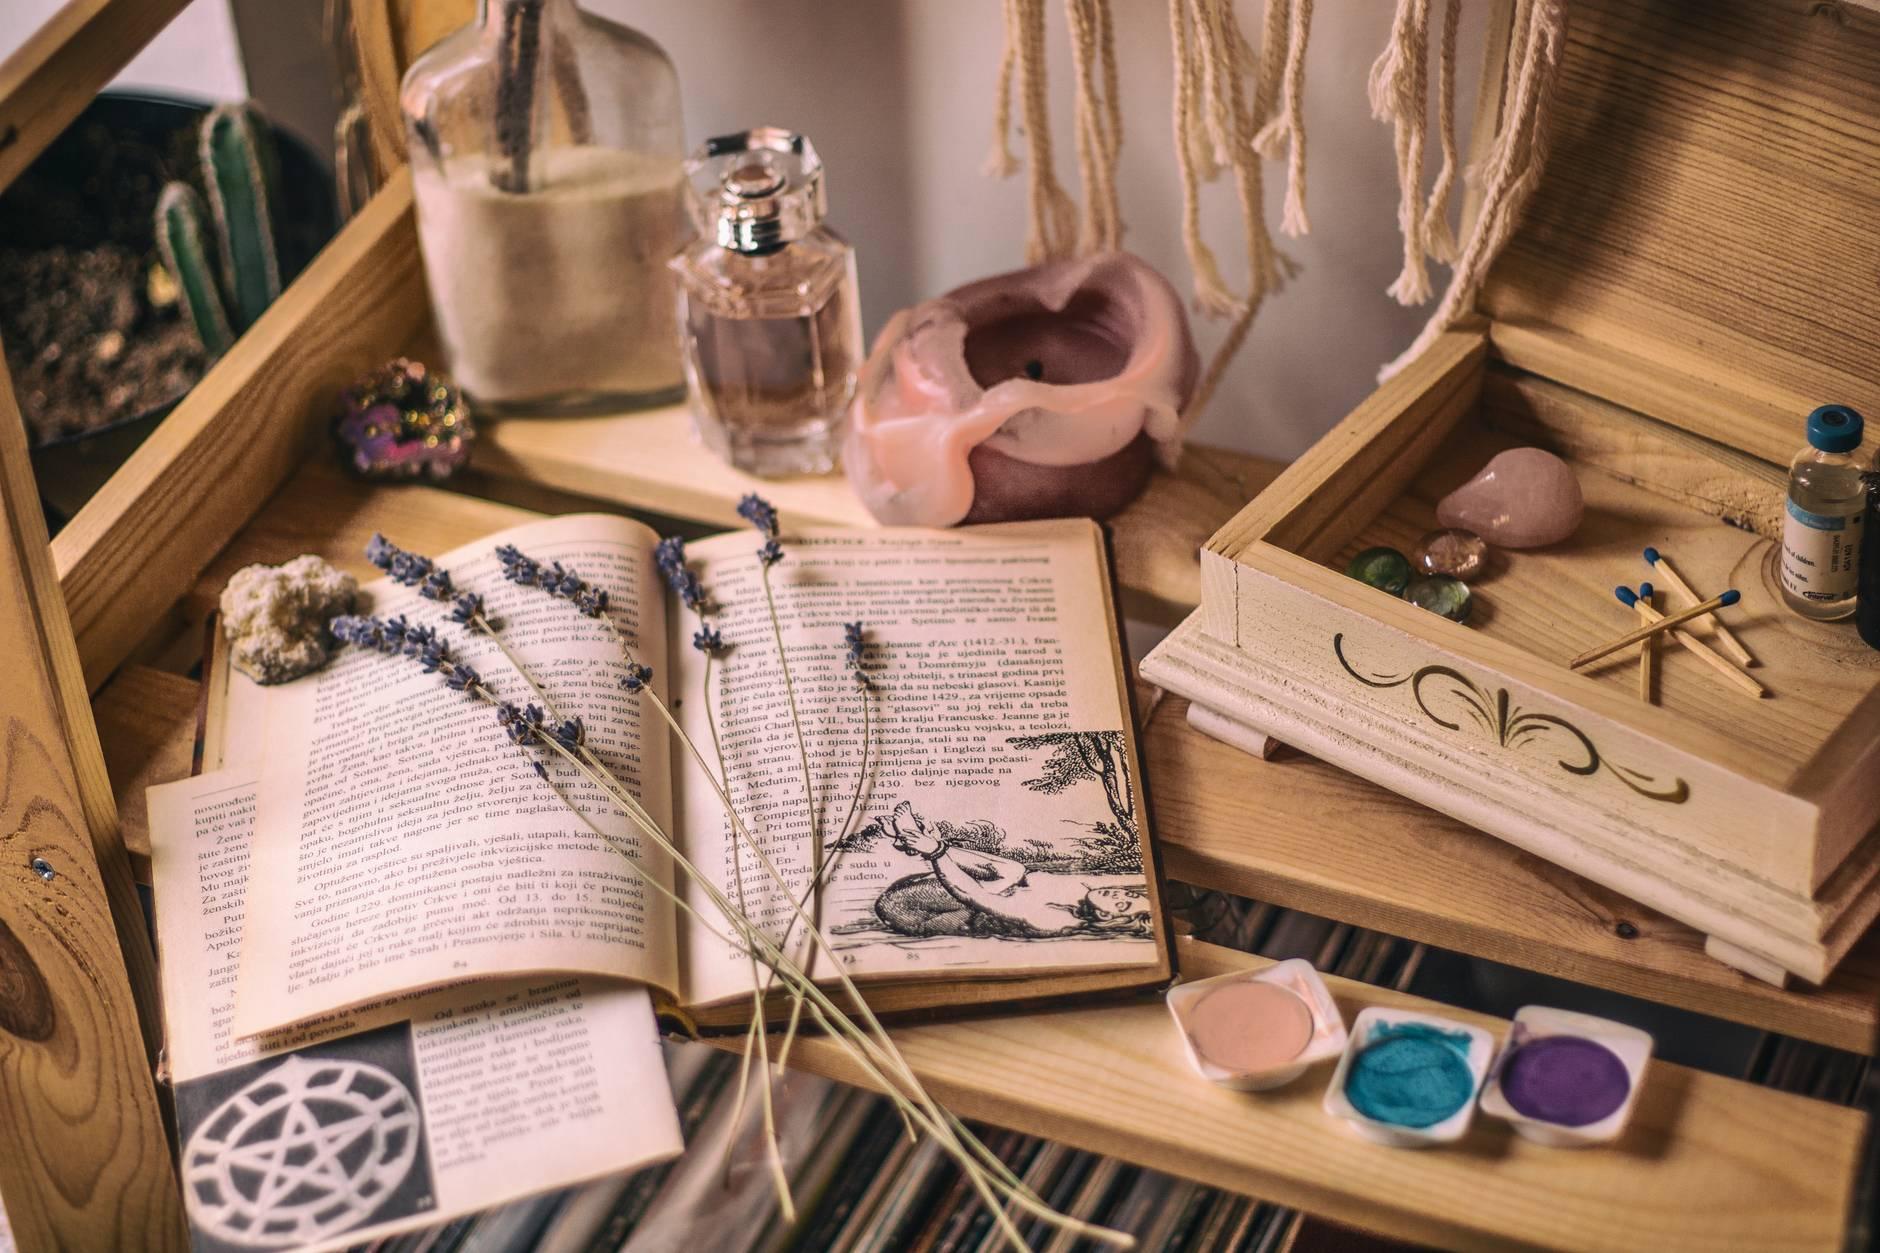 chakra healing, colors, nature, organic,